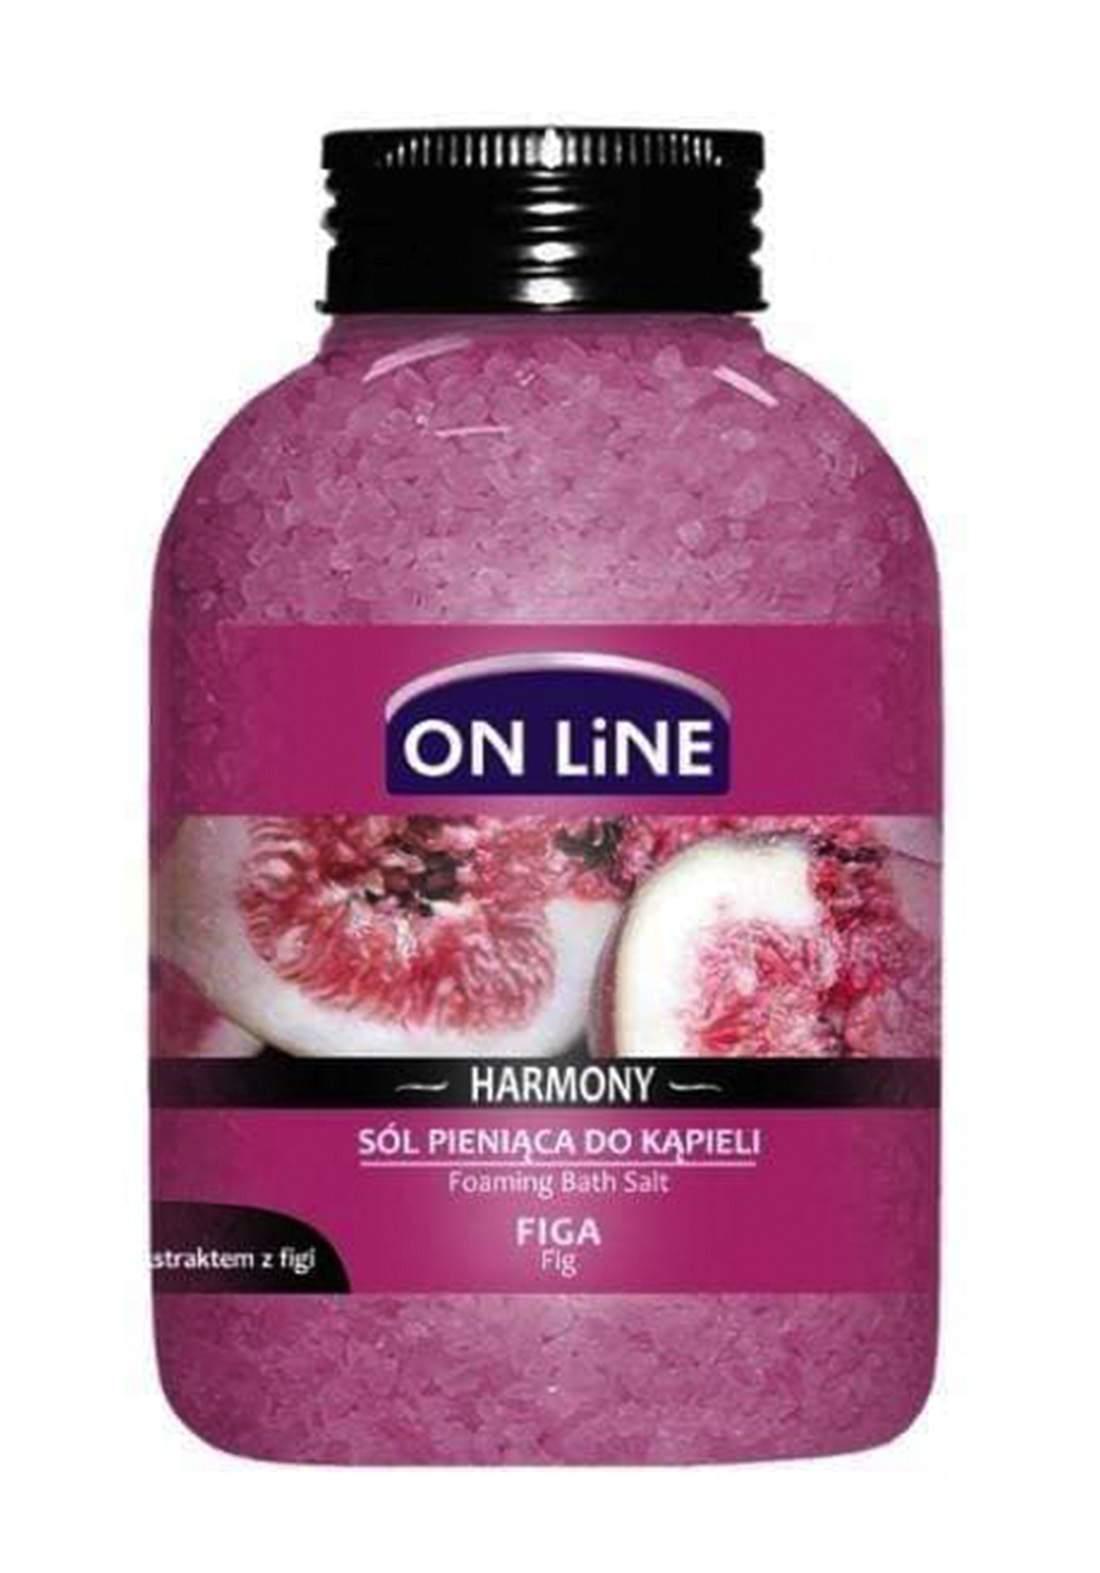 Online Harmony Figa 600g املاح العناية بالجسم